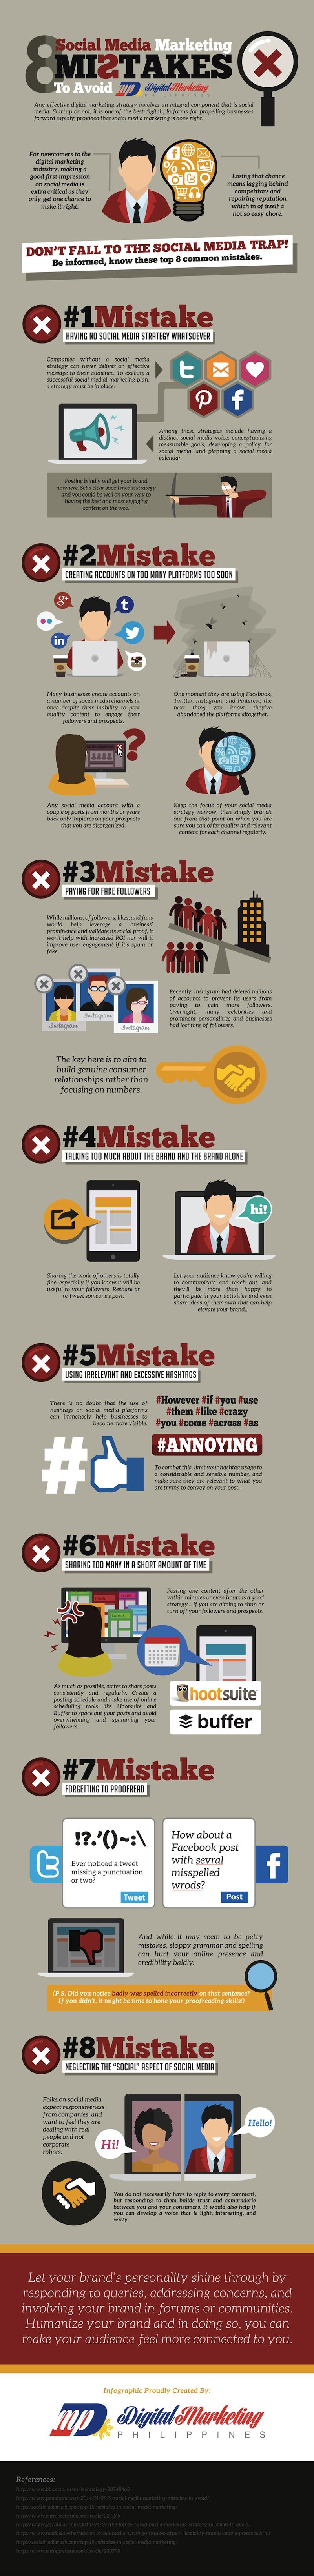 8-Social-Media-Marketing-Mistakes-to-Avoid.jpg